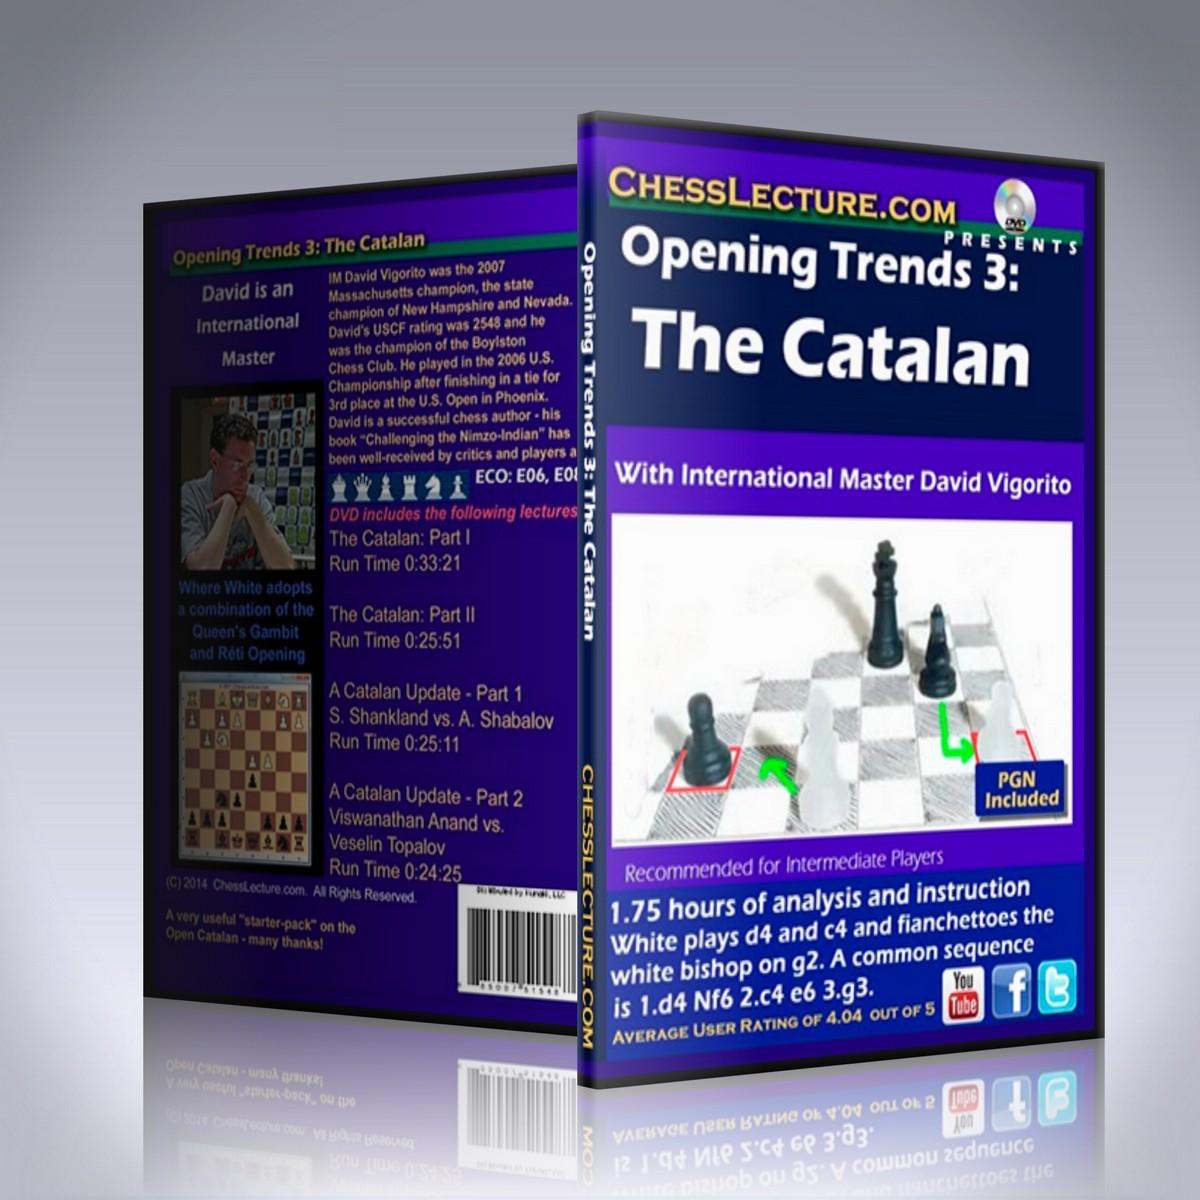 Opening Trends 3: The Catalan – IM David Vigorito